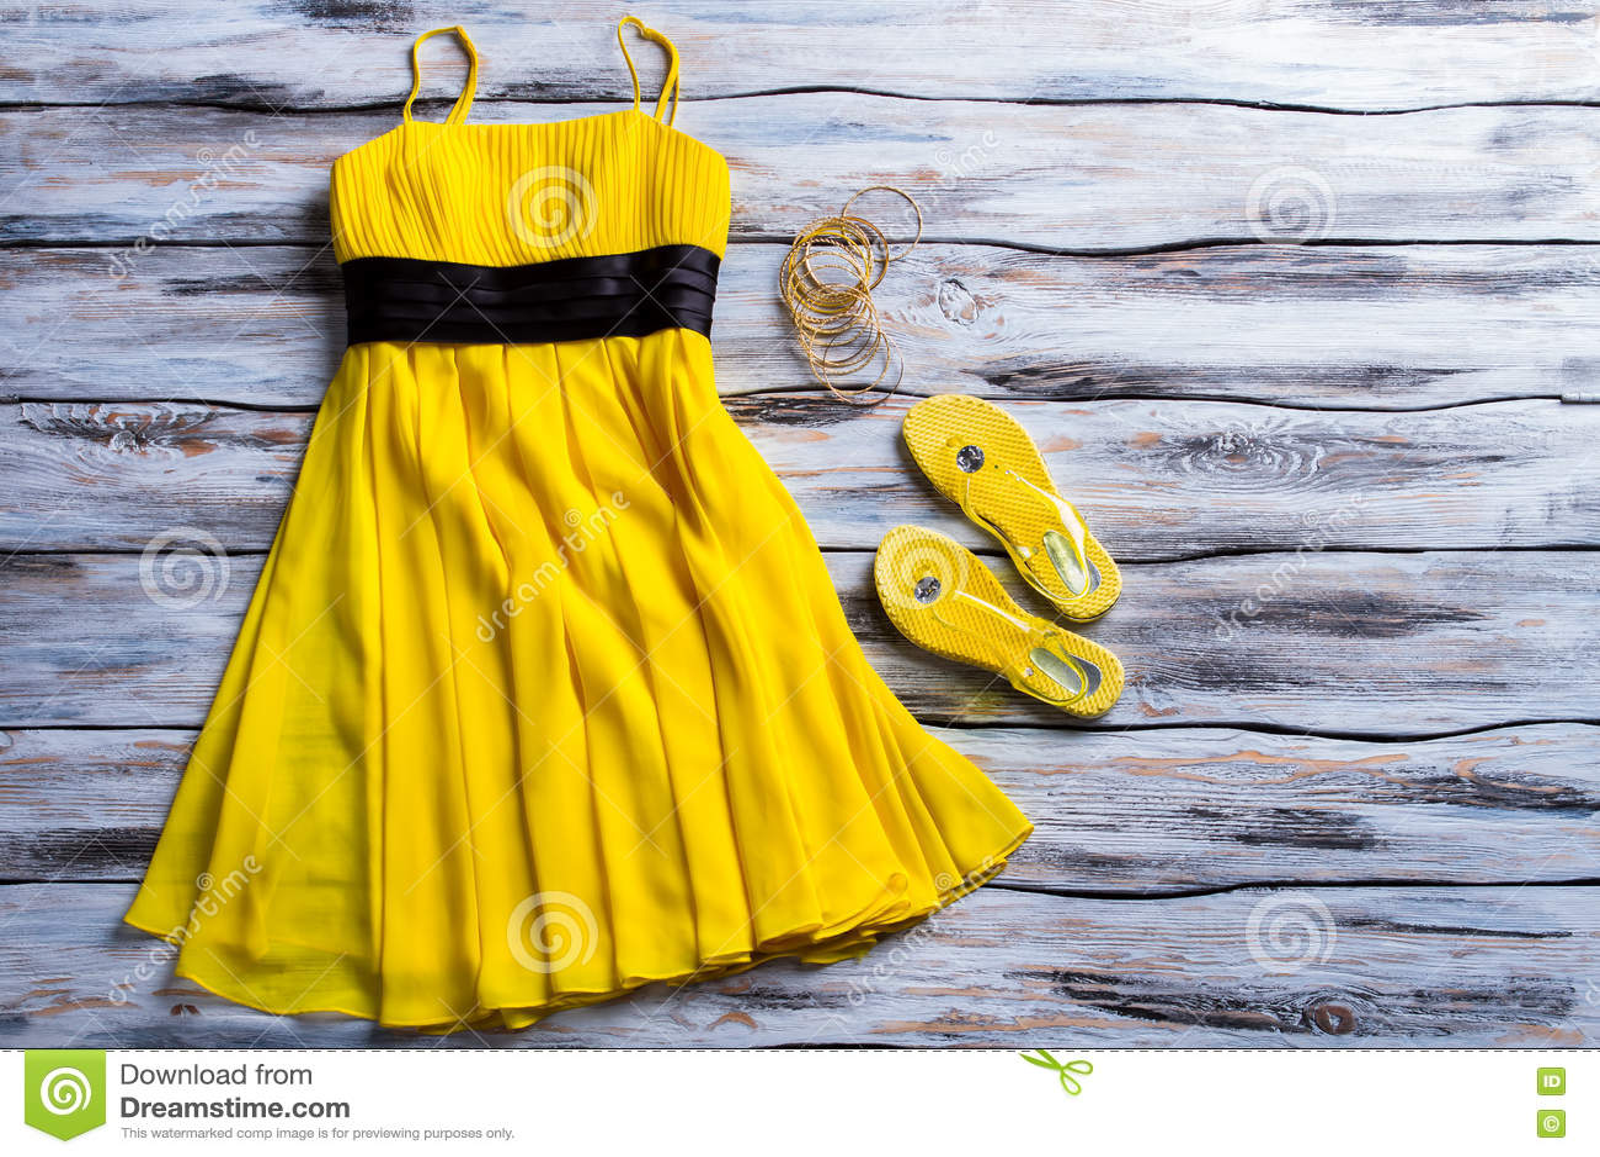 Yellow dress and flip flops.